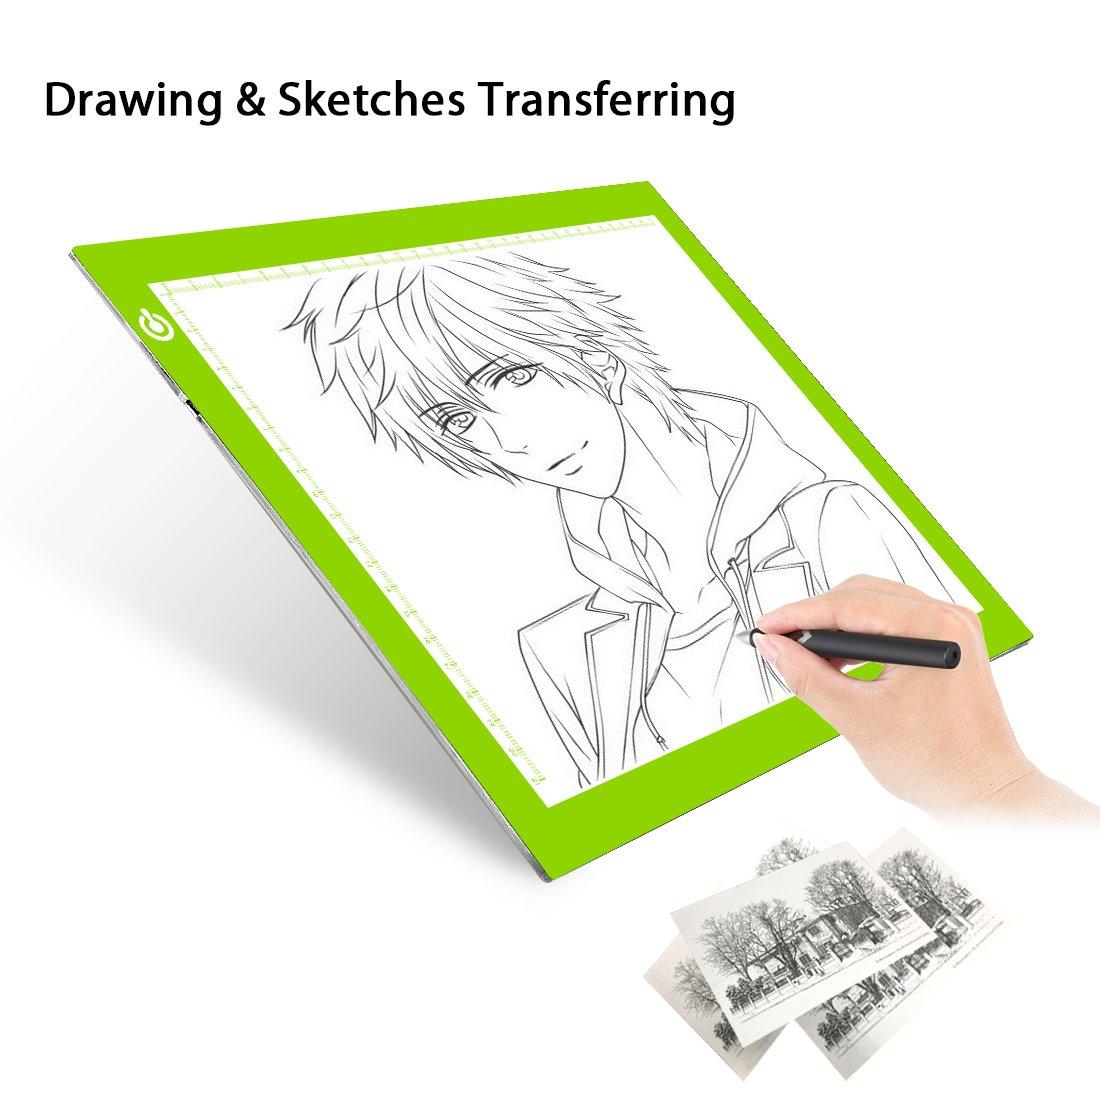 Tracing Light Table Ultra-thin A4 LED Copy Board NXENTC Light Pad Drawing Display Pad Brightness Adjustable Stencil Artist Art Tracing Tatto Table Green